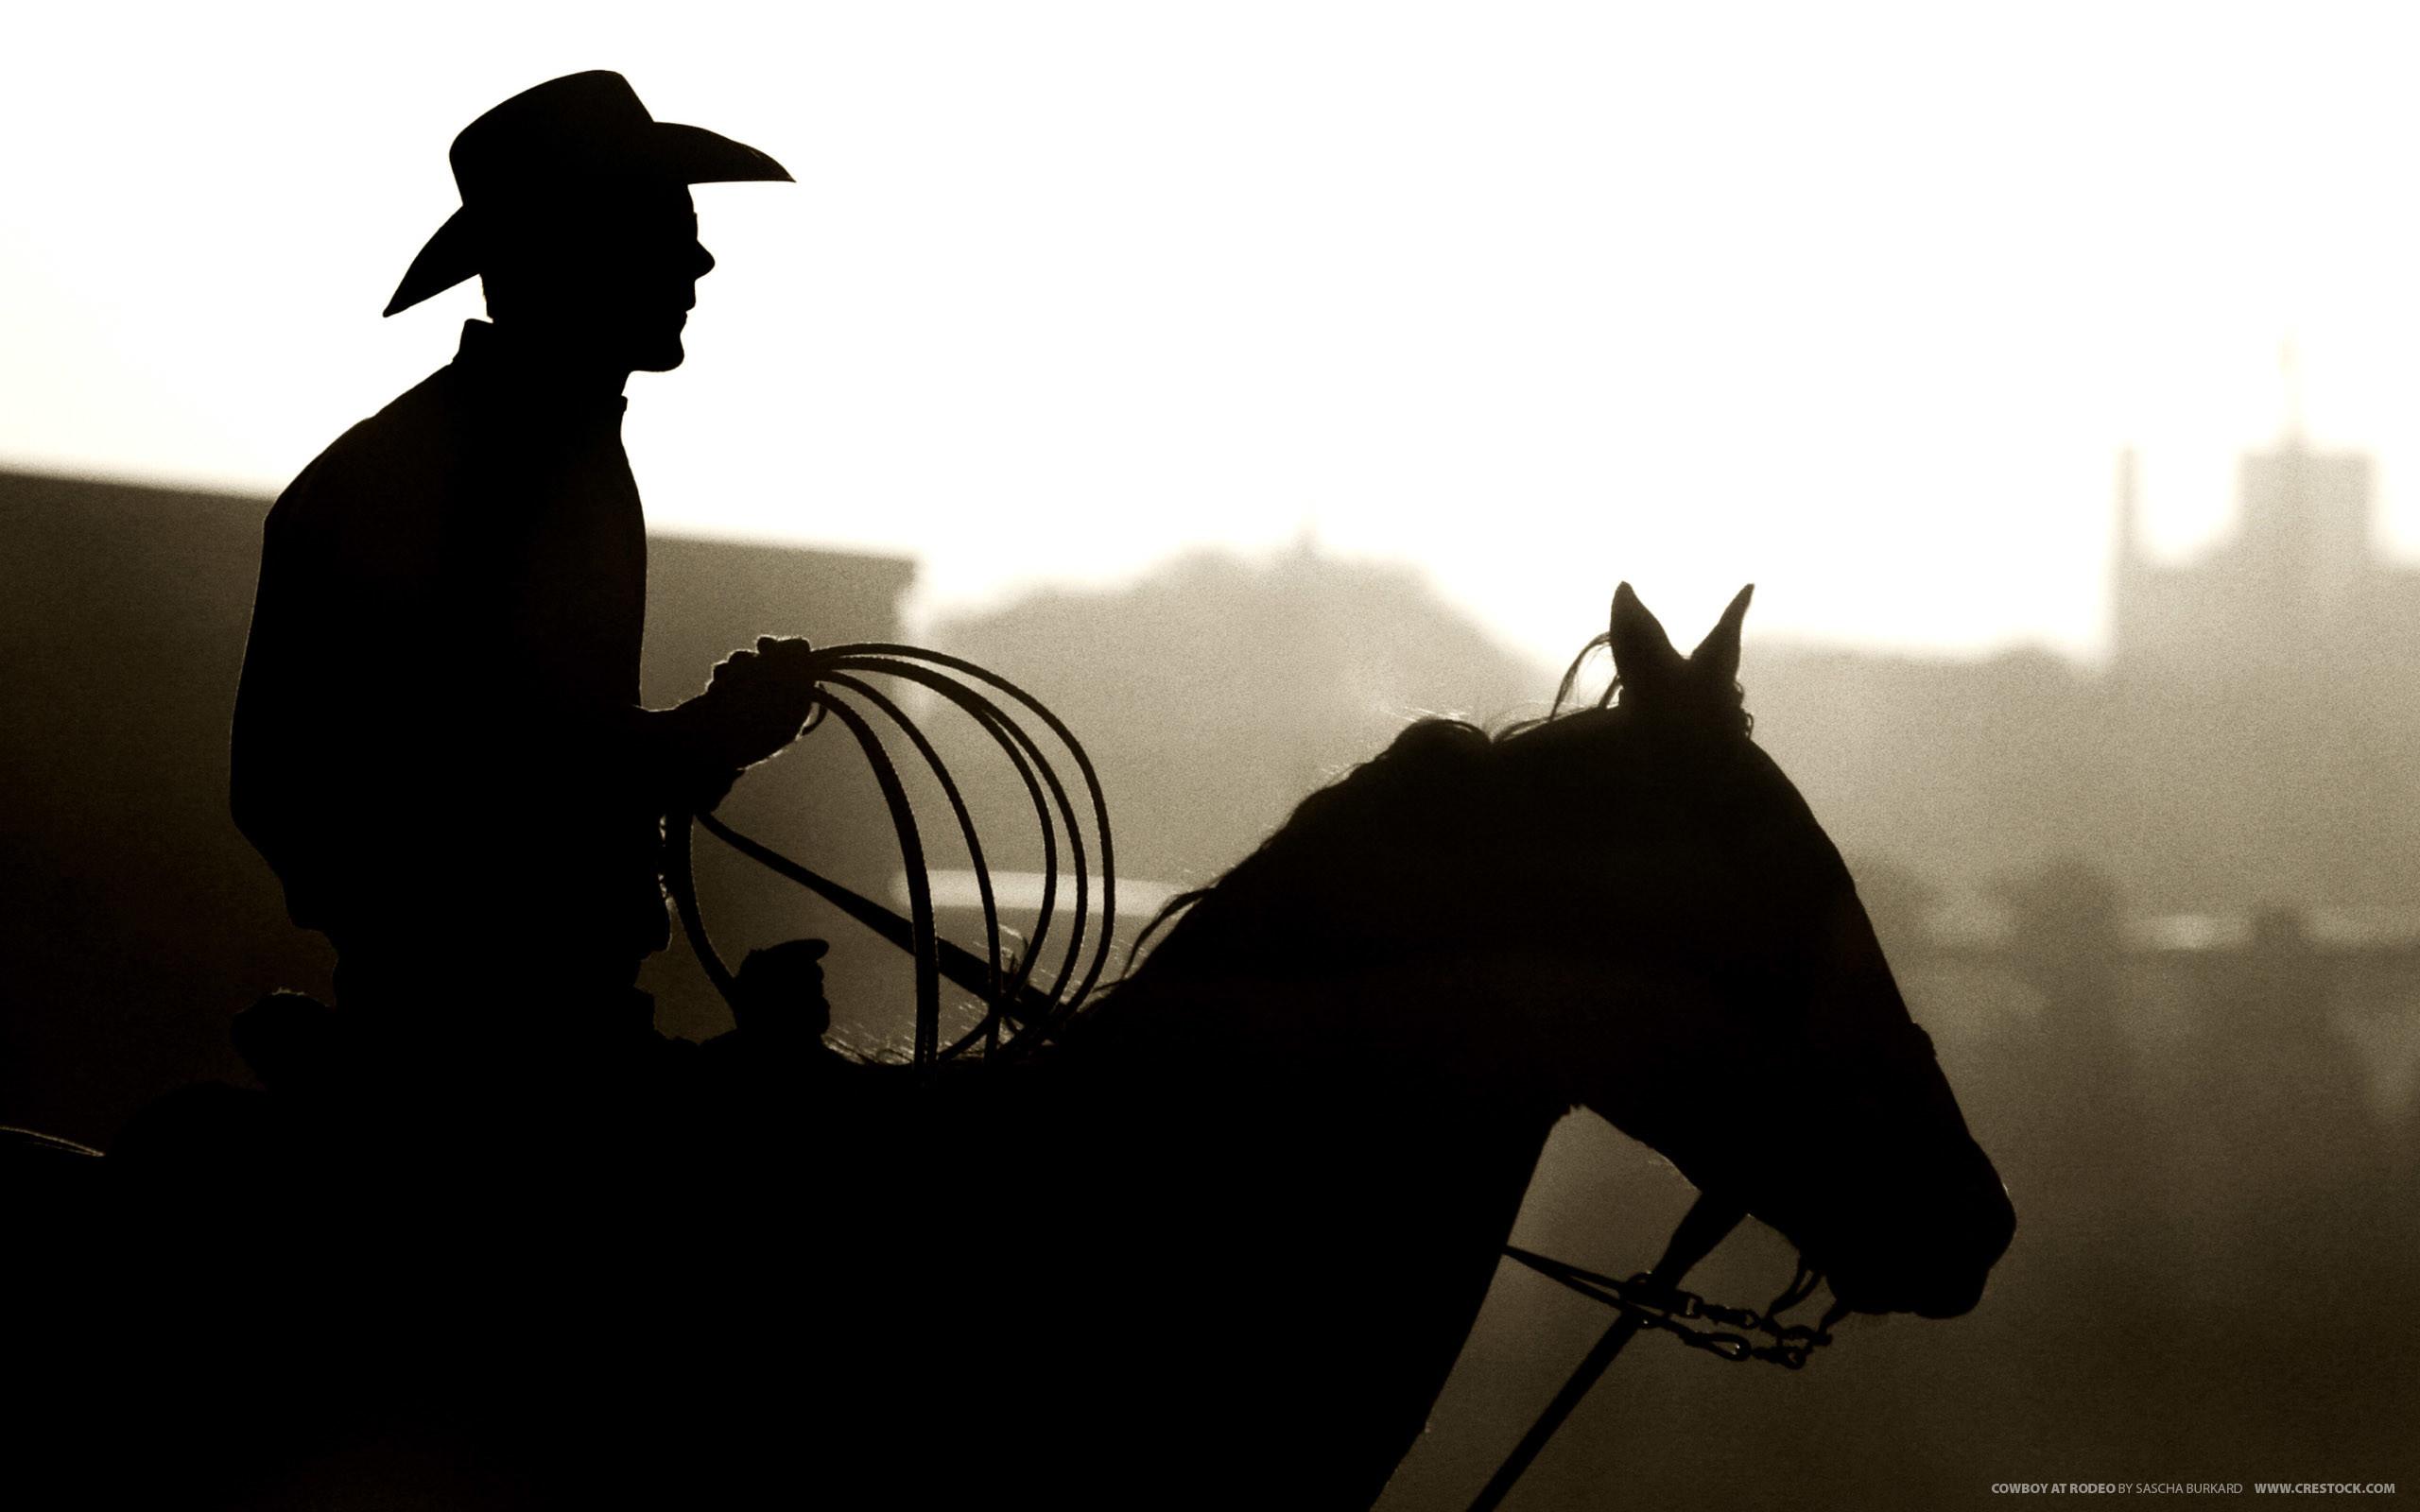 Cowboy at Rodeo   2560 x 1600   Download   Close